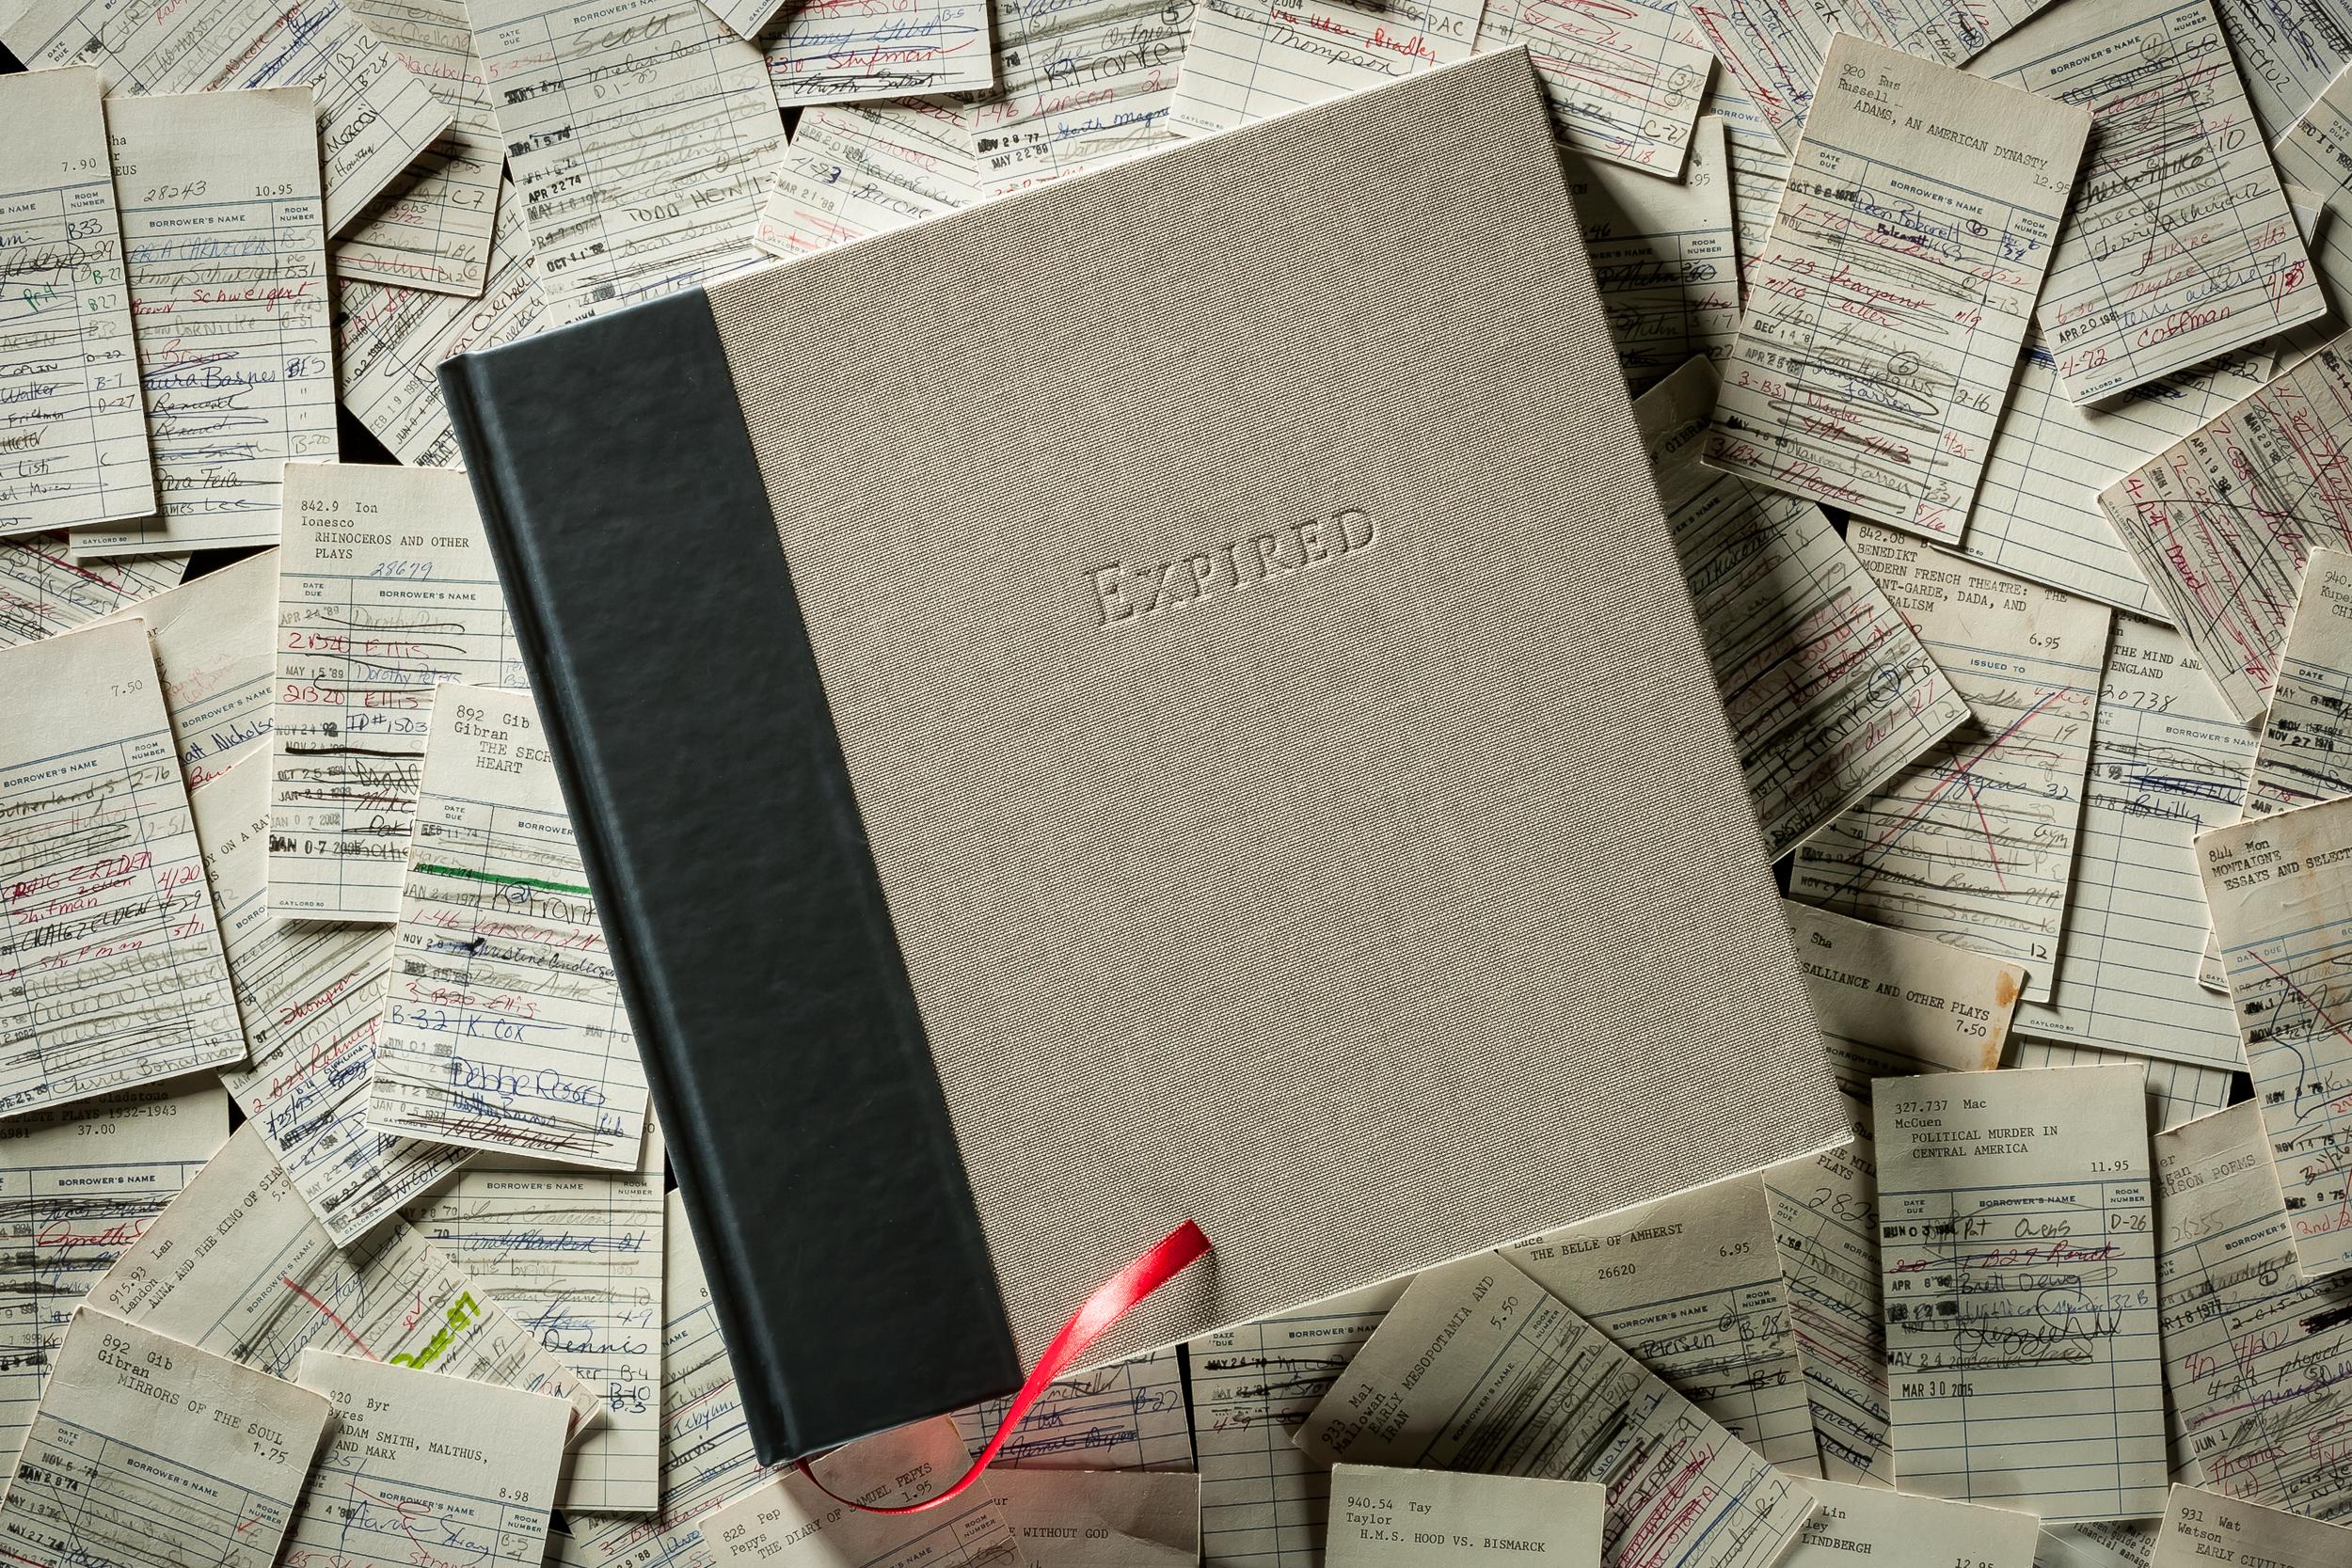 170506_ExpiredBook_0111.jpg